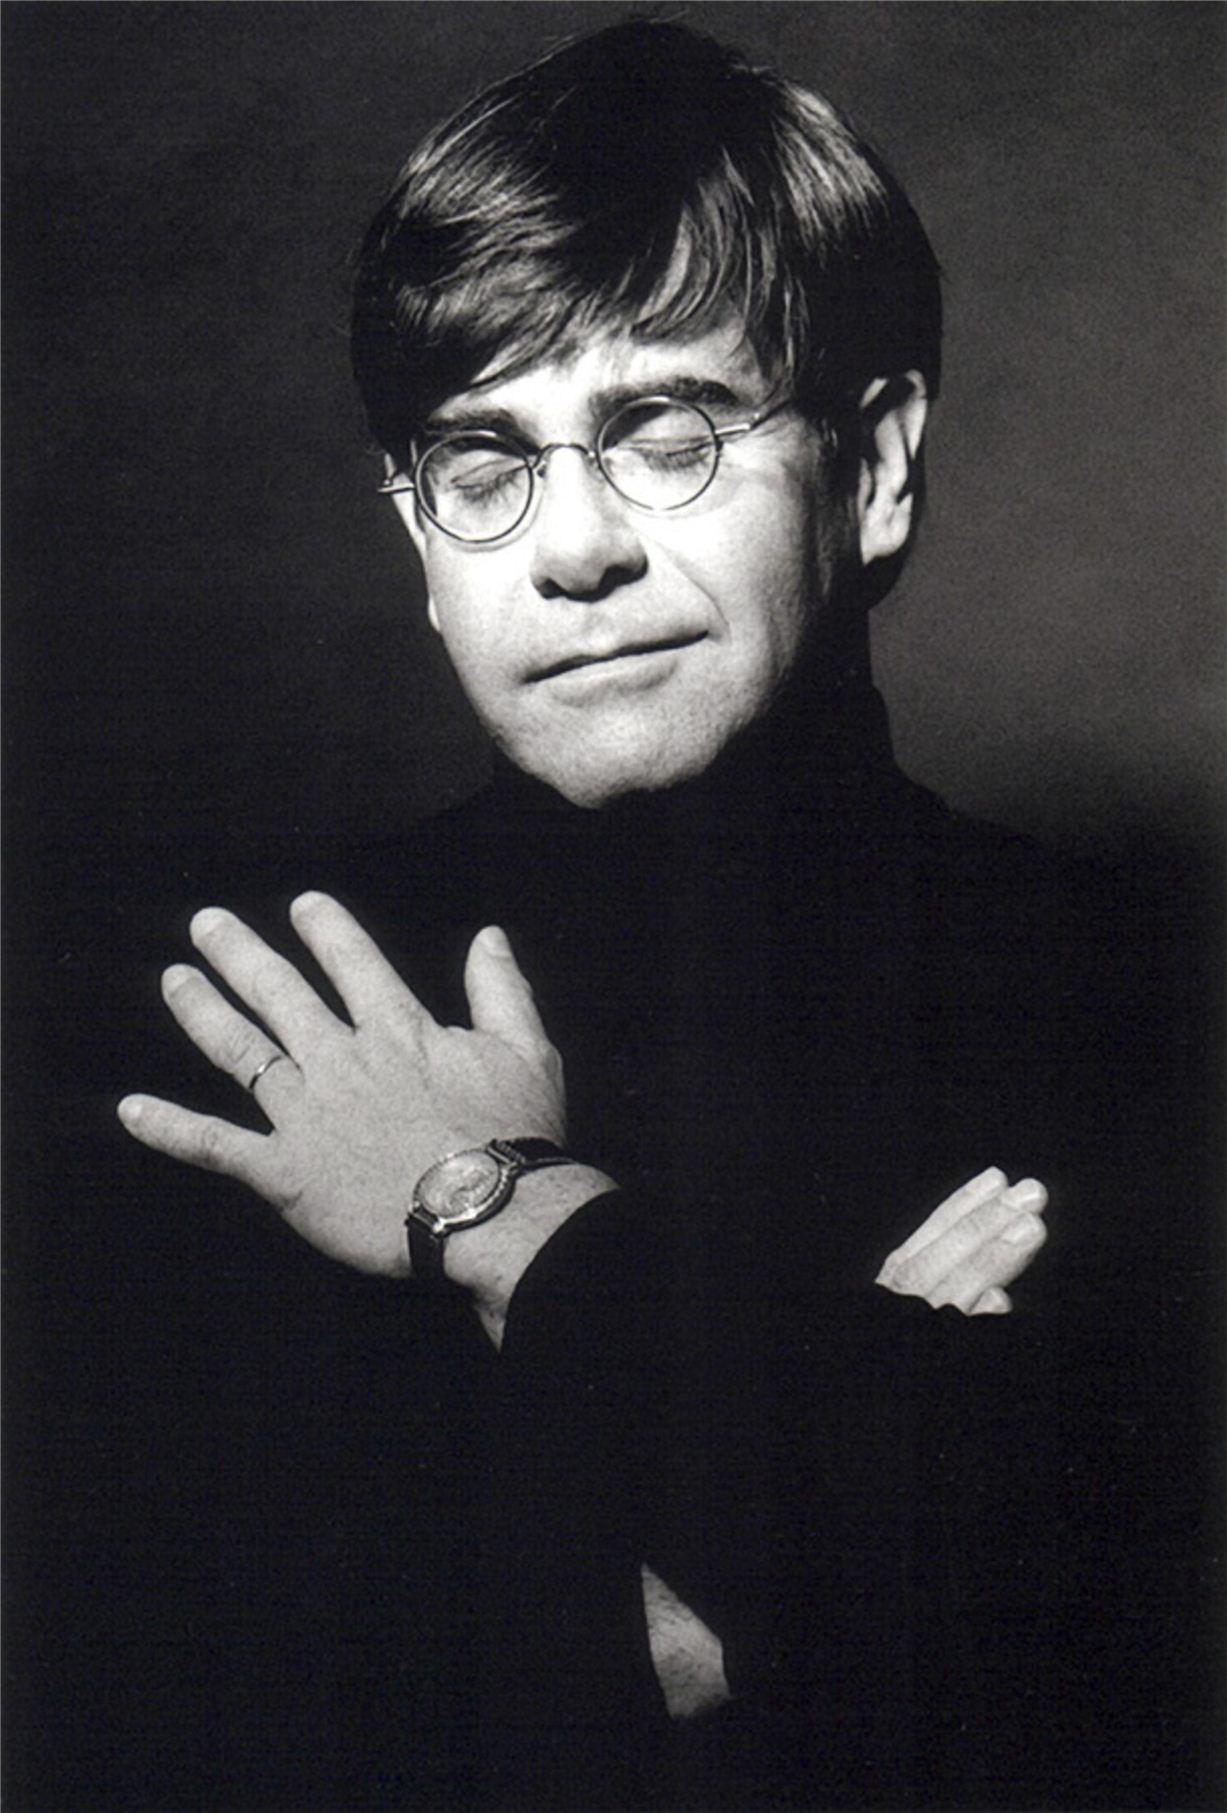 Elton John / Элтон Джон - портрет фотографа Грега Гормана / Greg Gorman